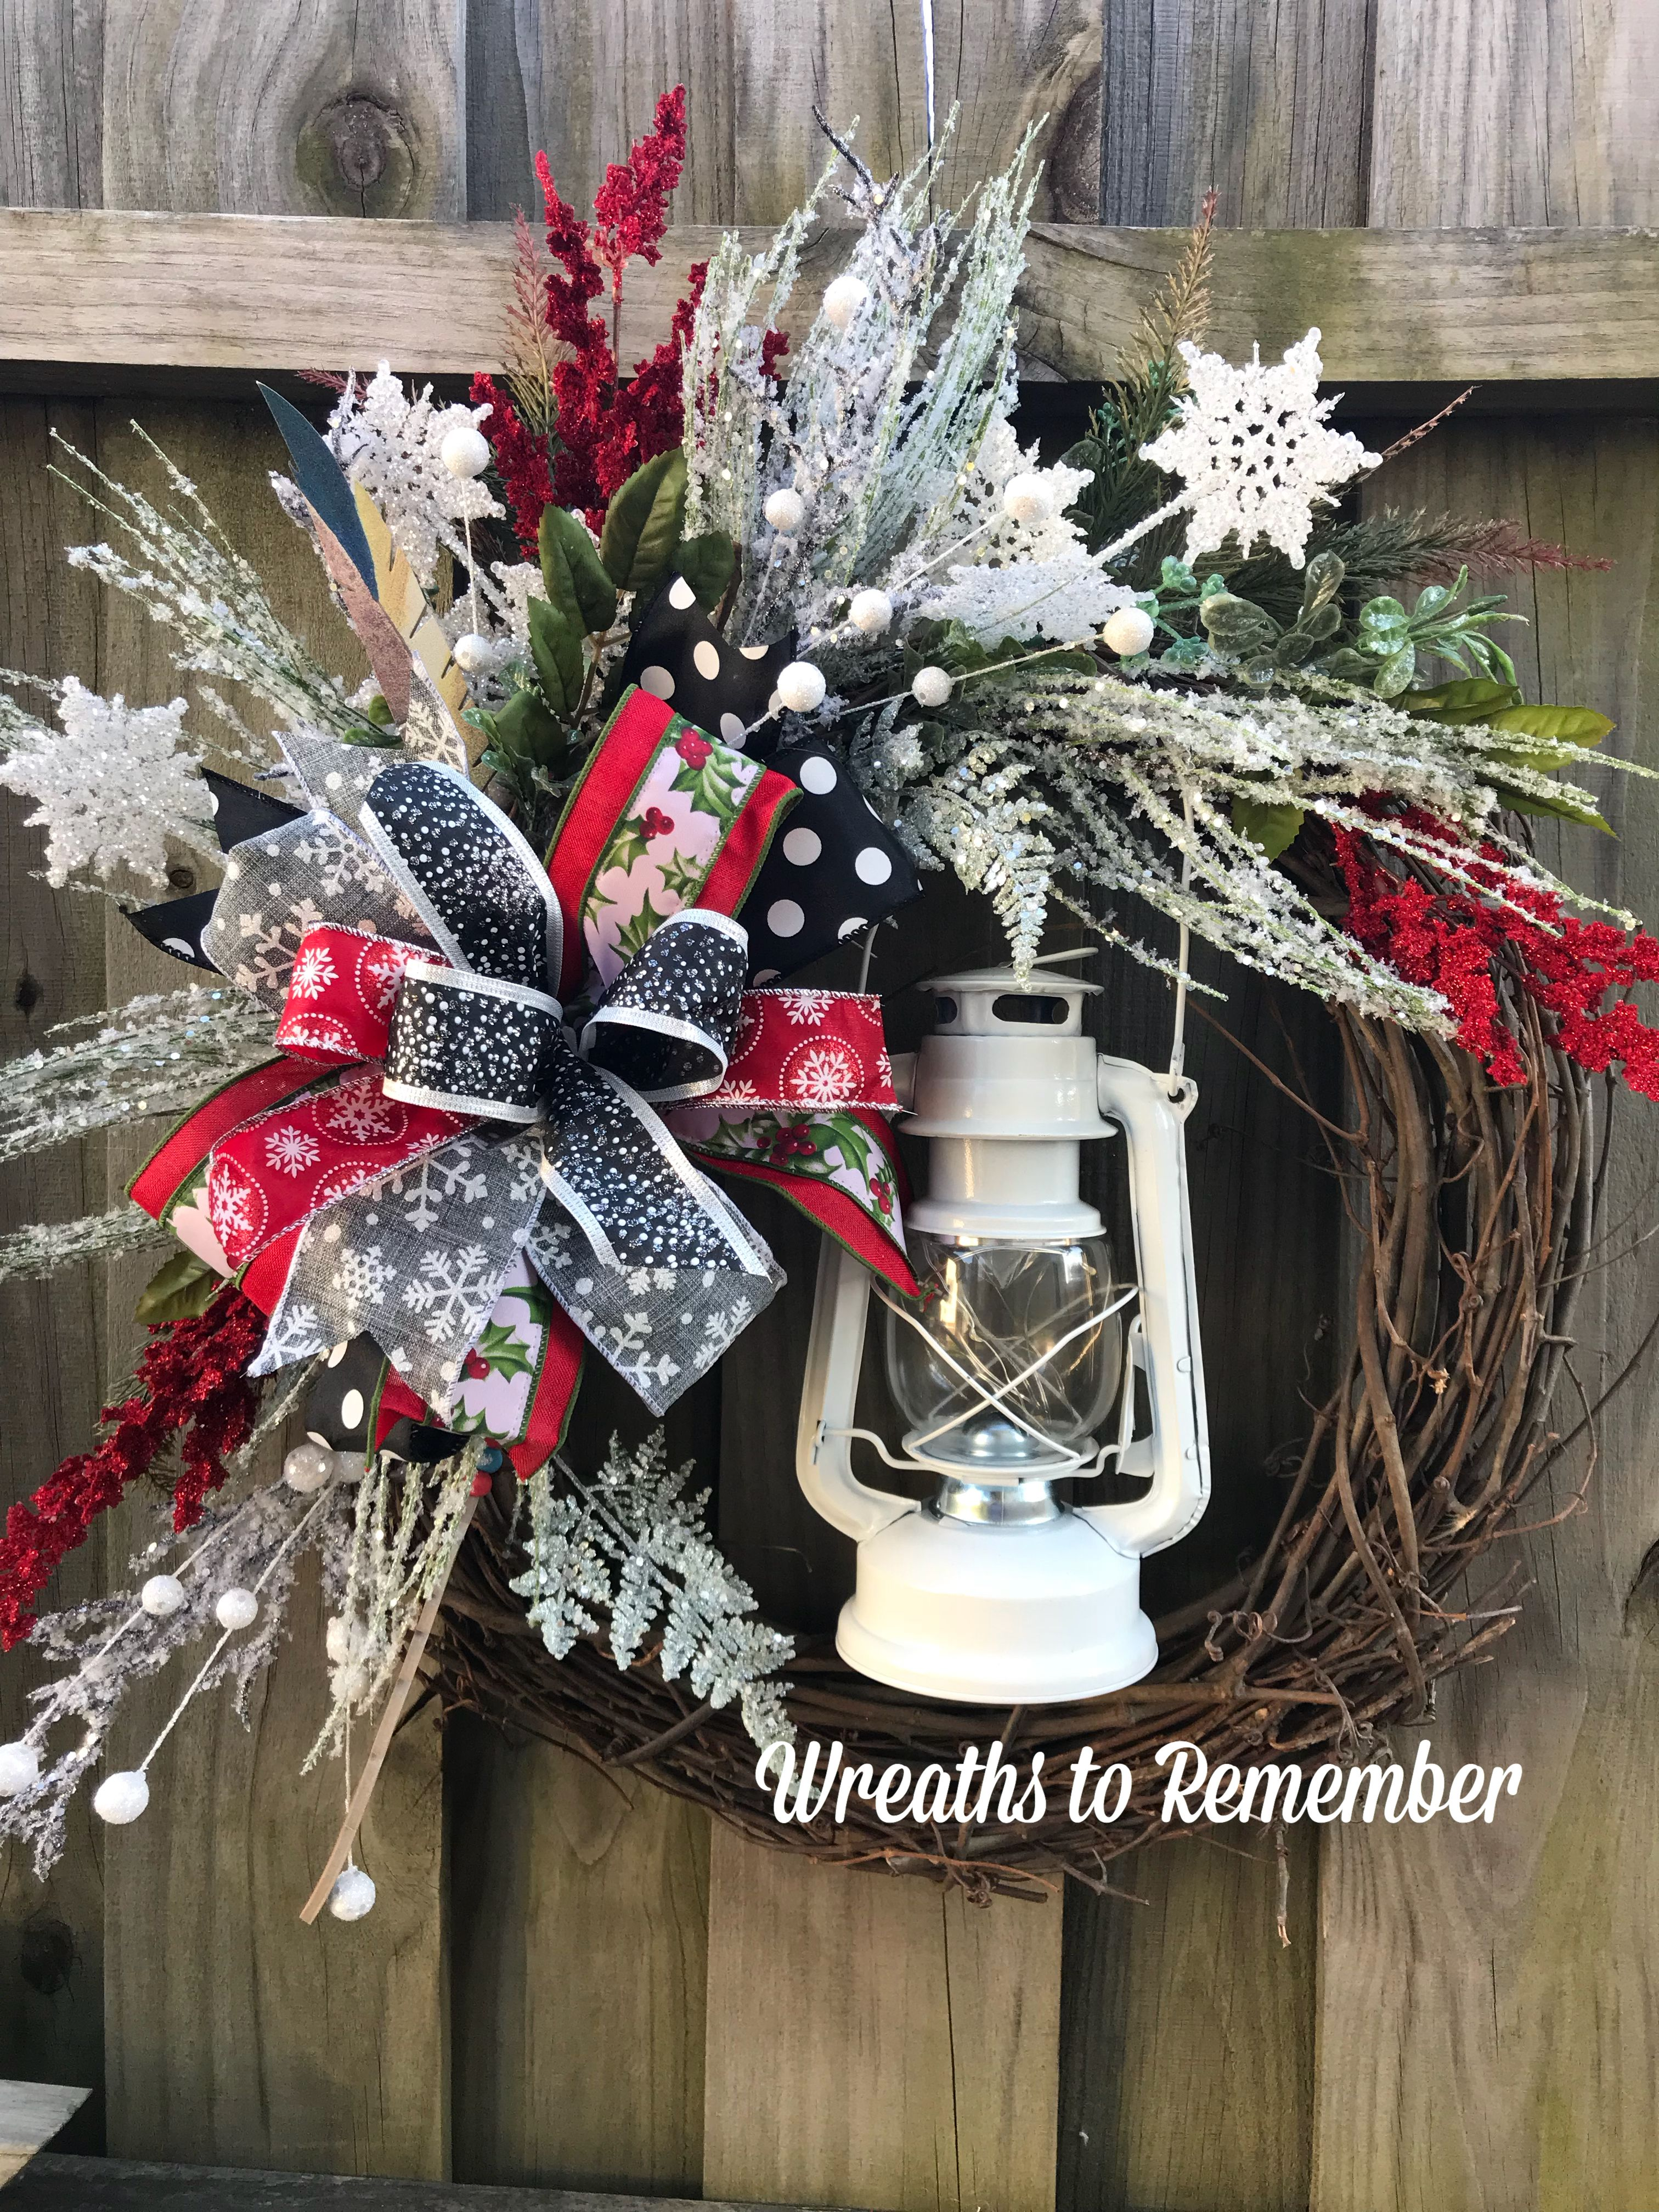 Lantern wreath grapevine winter Wreath icy winter wreath